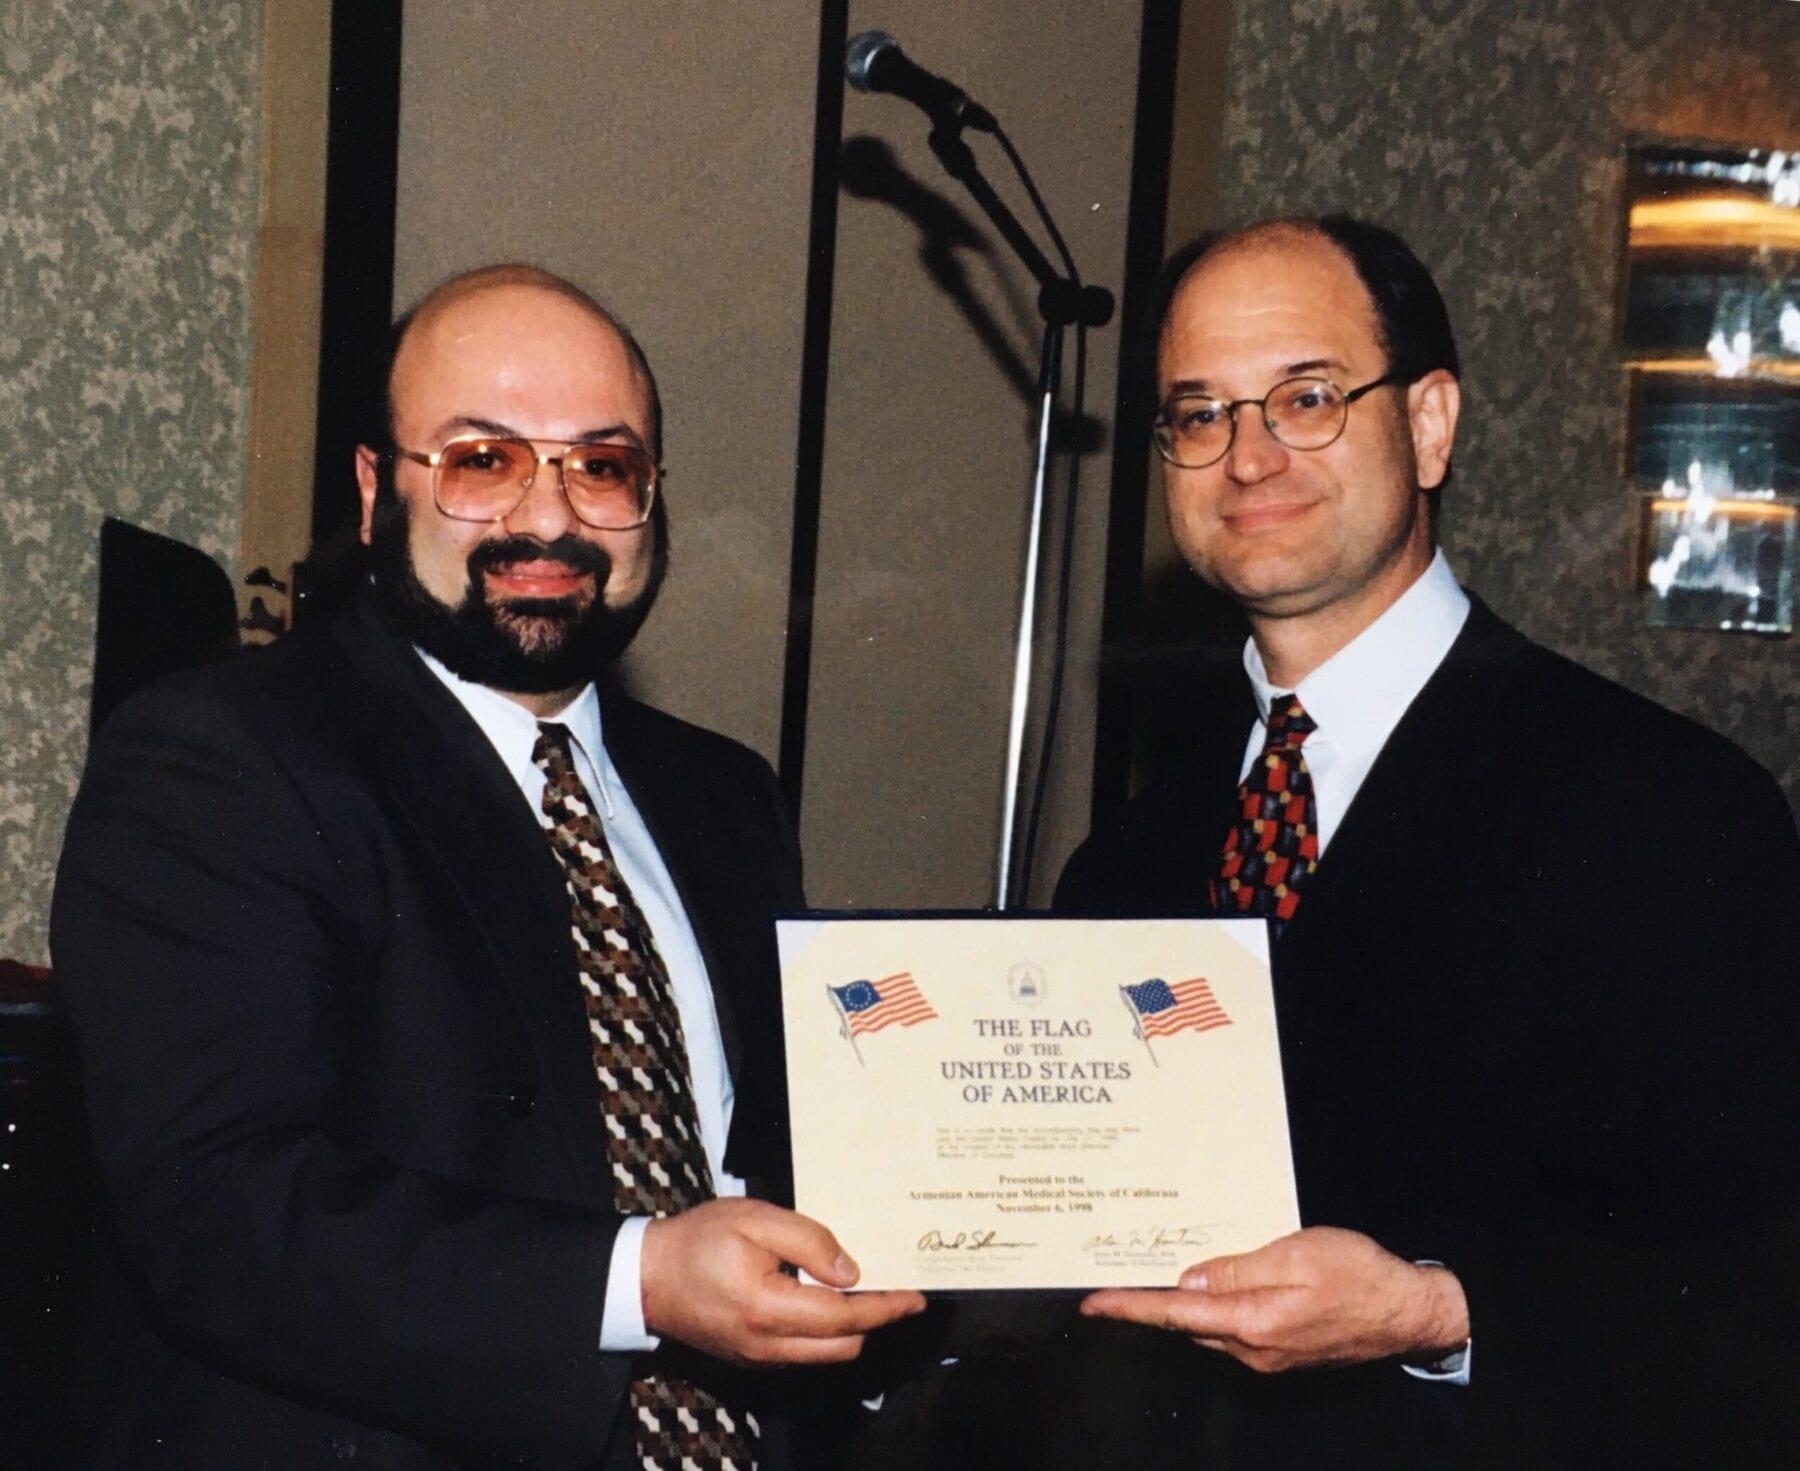 Dr. David Davtyan Receiving Commendation From U.s. Congressman Brad Sherman In Los Angeles